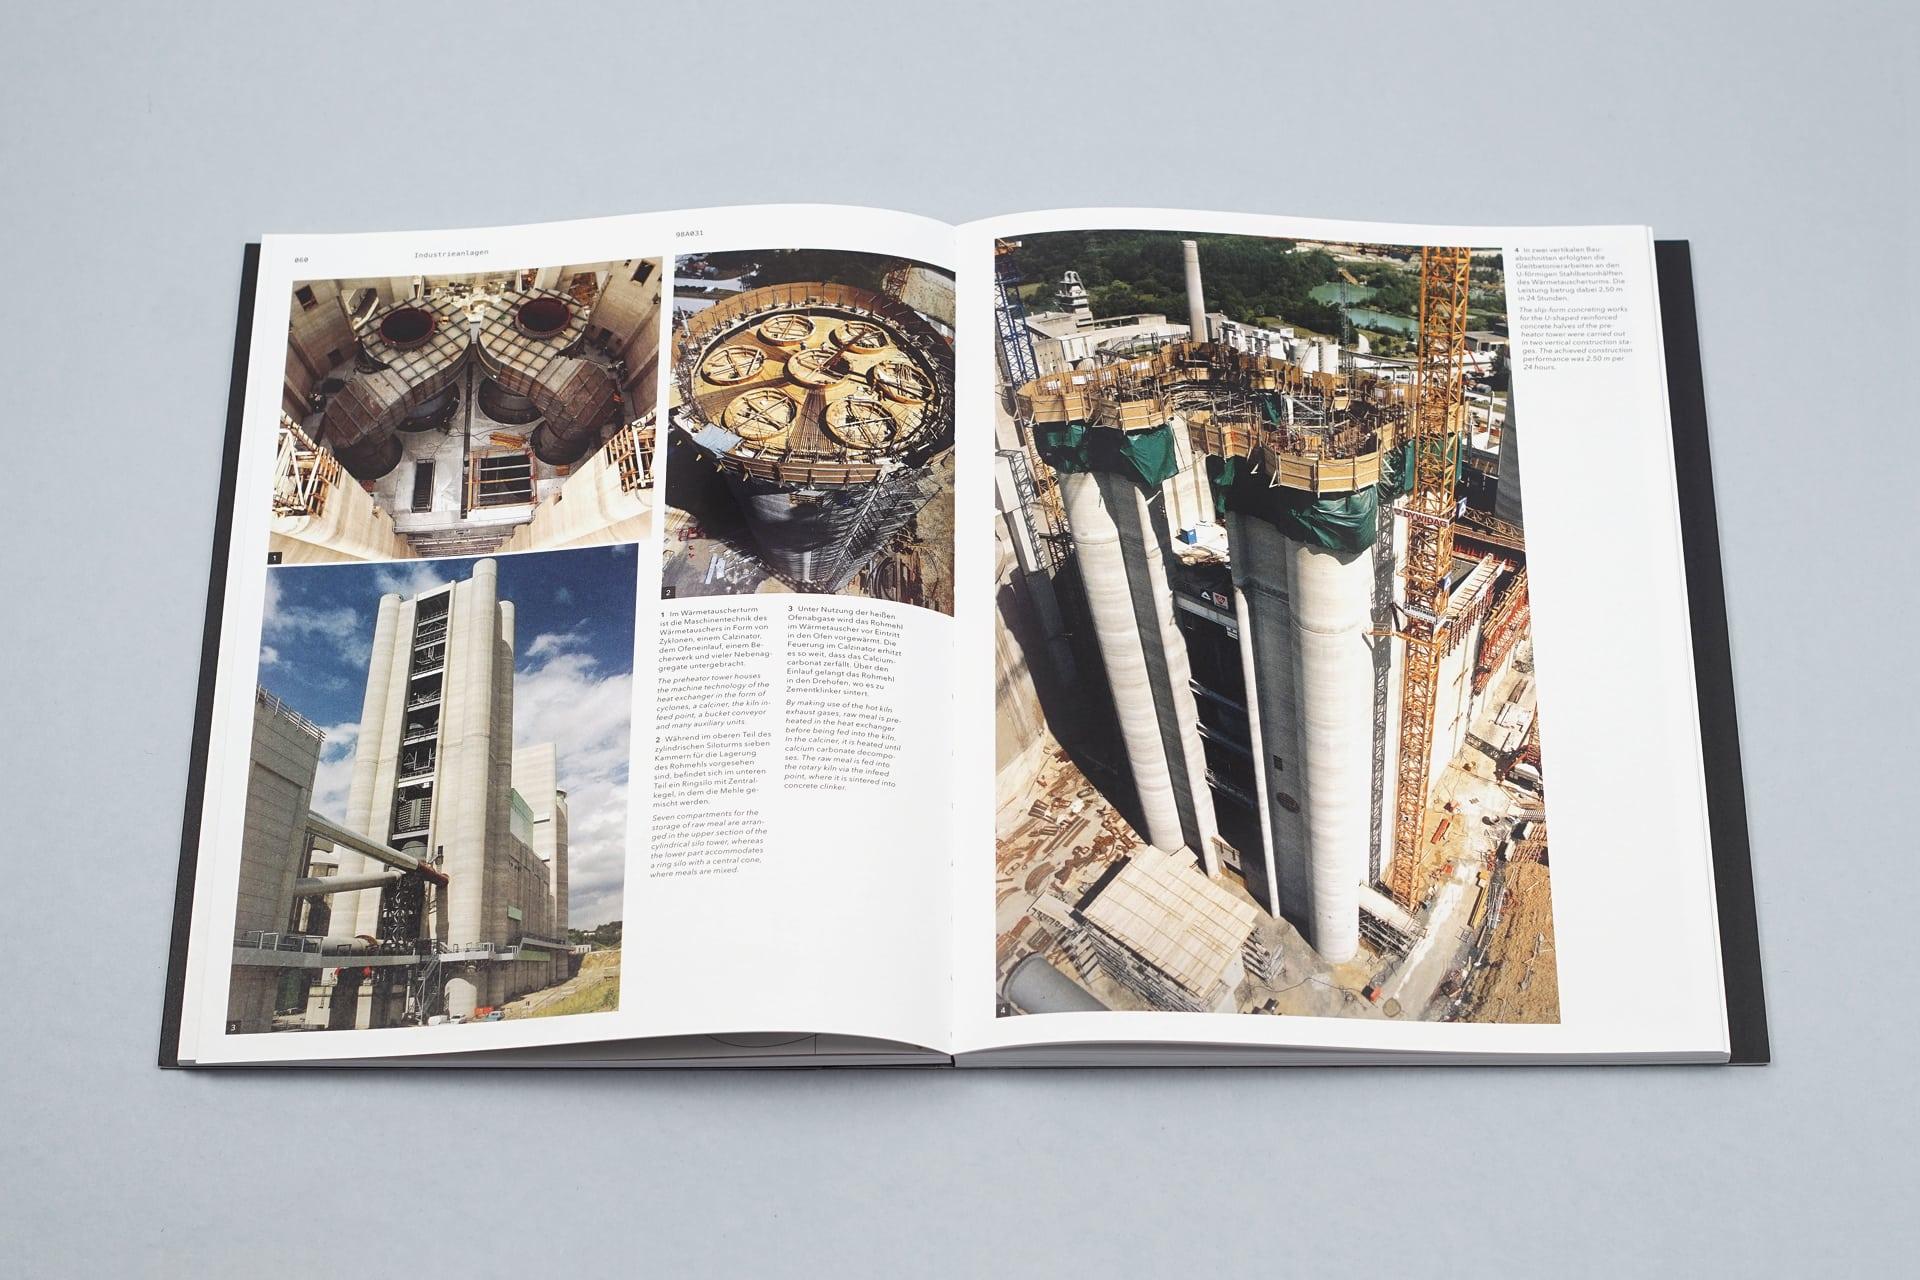 PUL Ingenieure – Monografie [Türme]